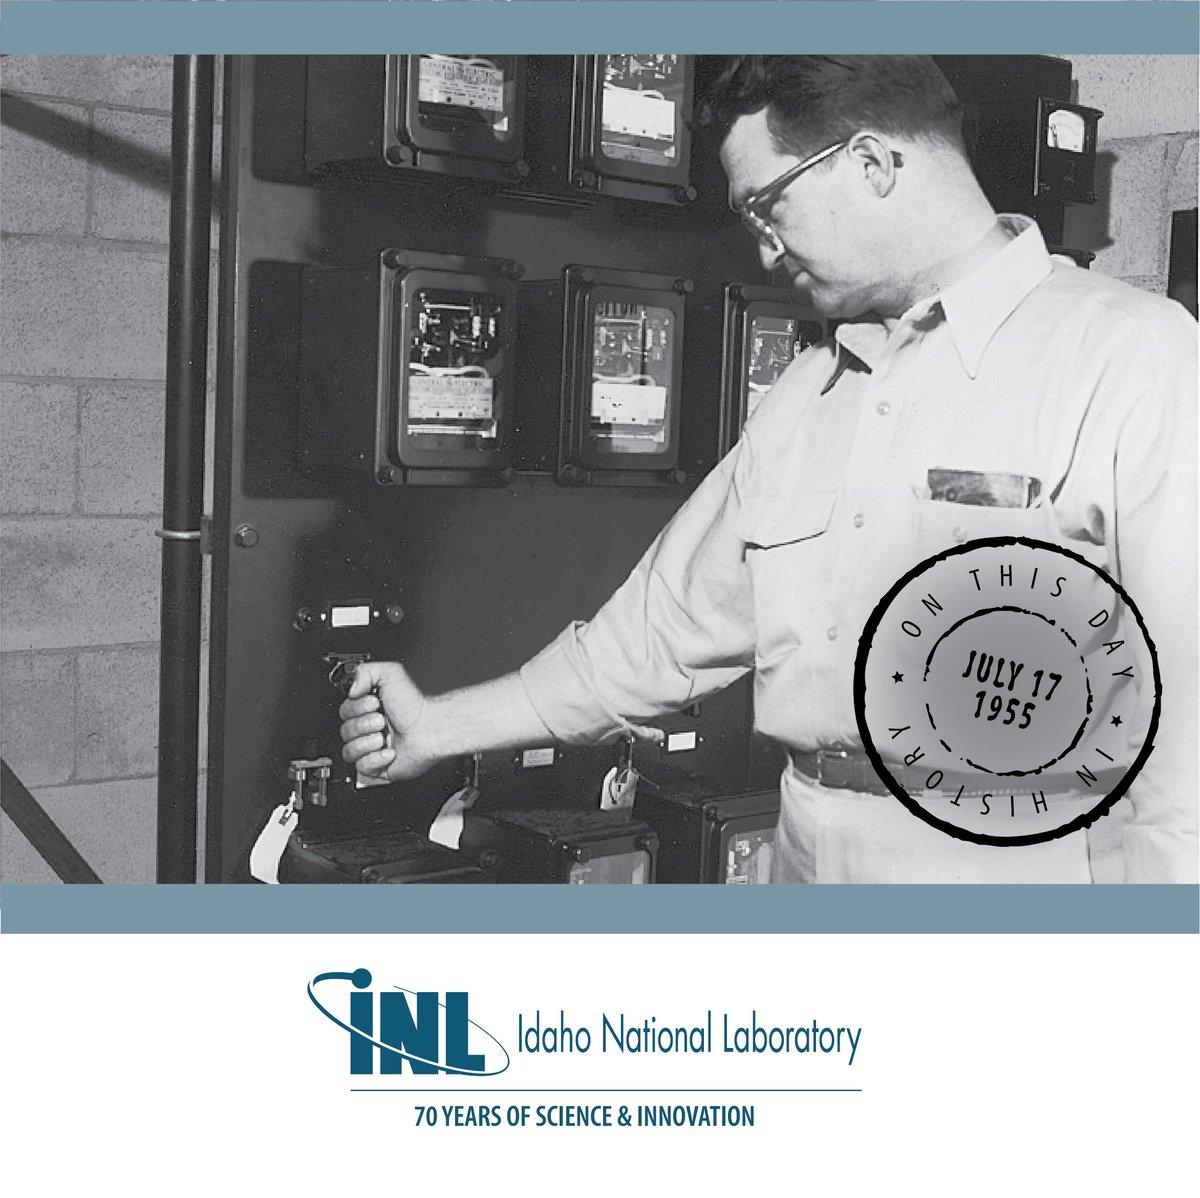 Idaho National Lab on Twitter: